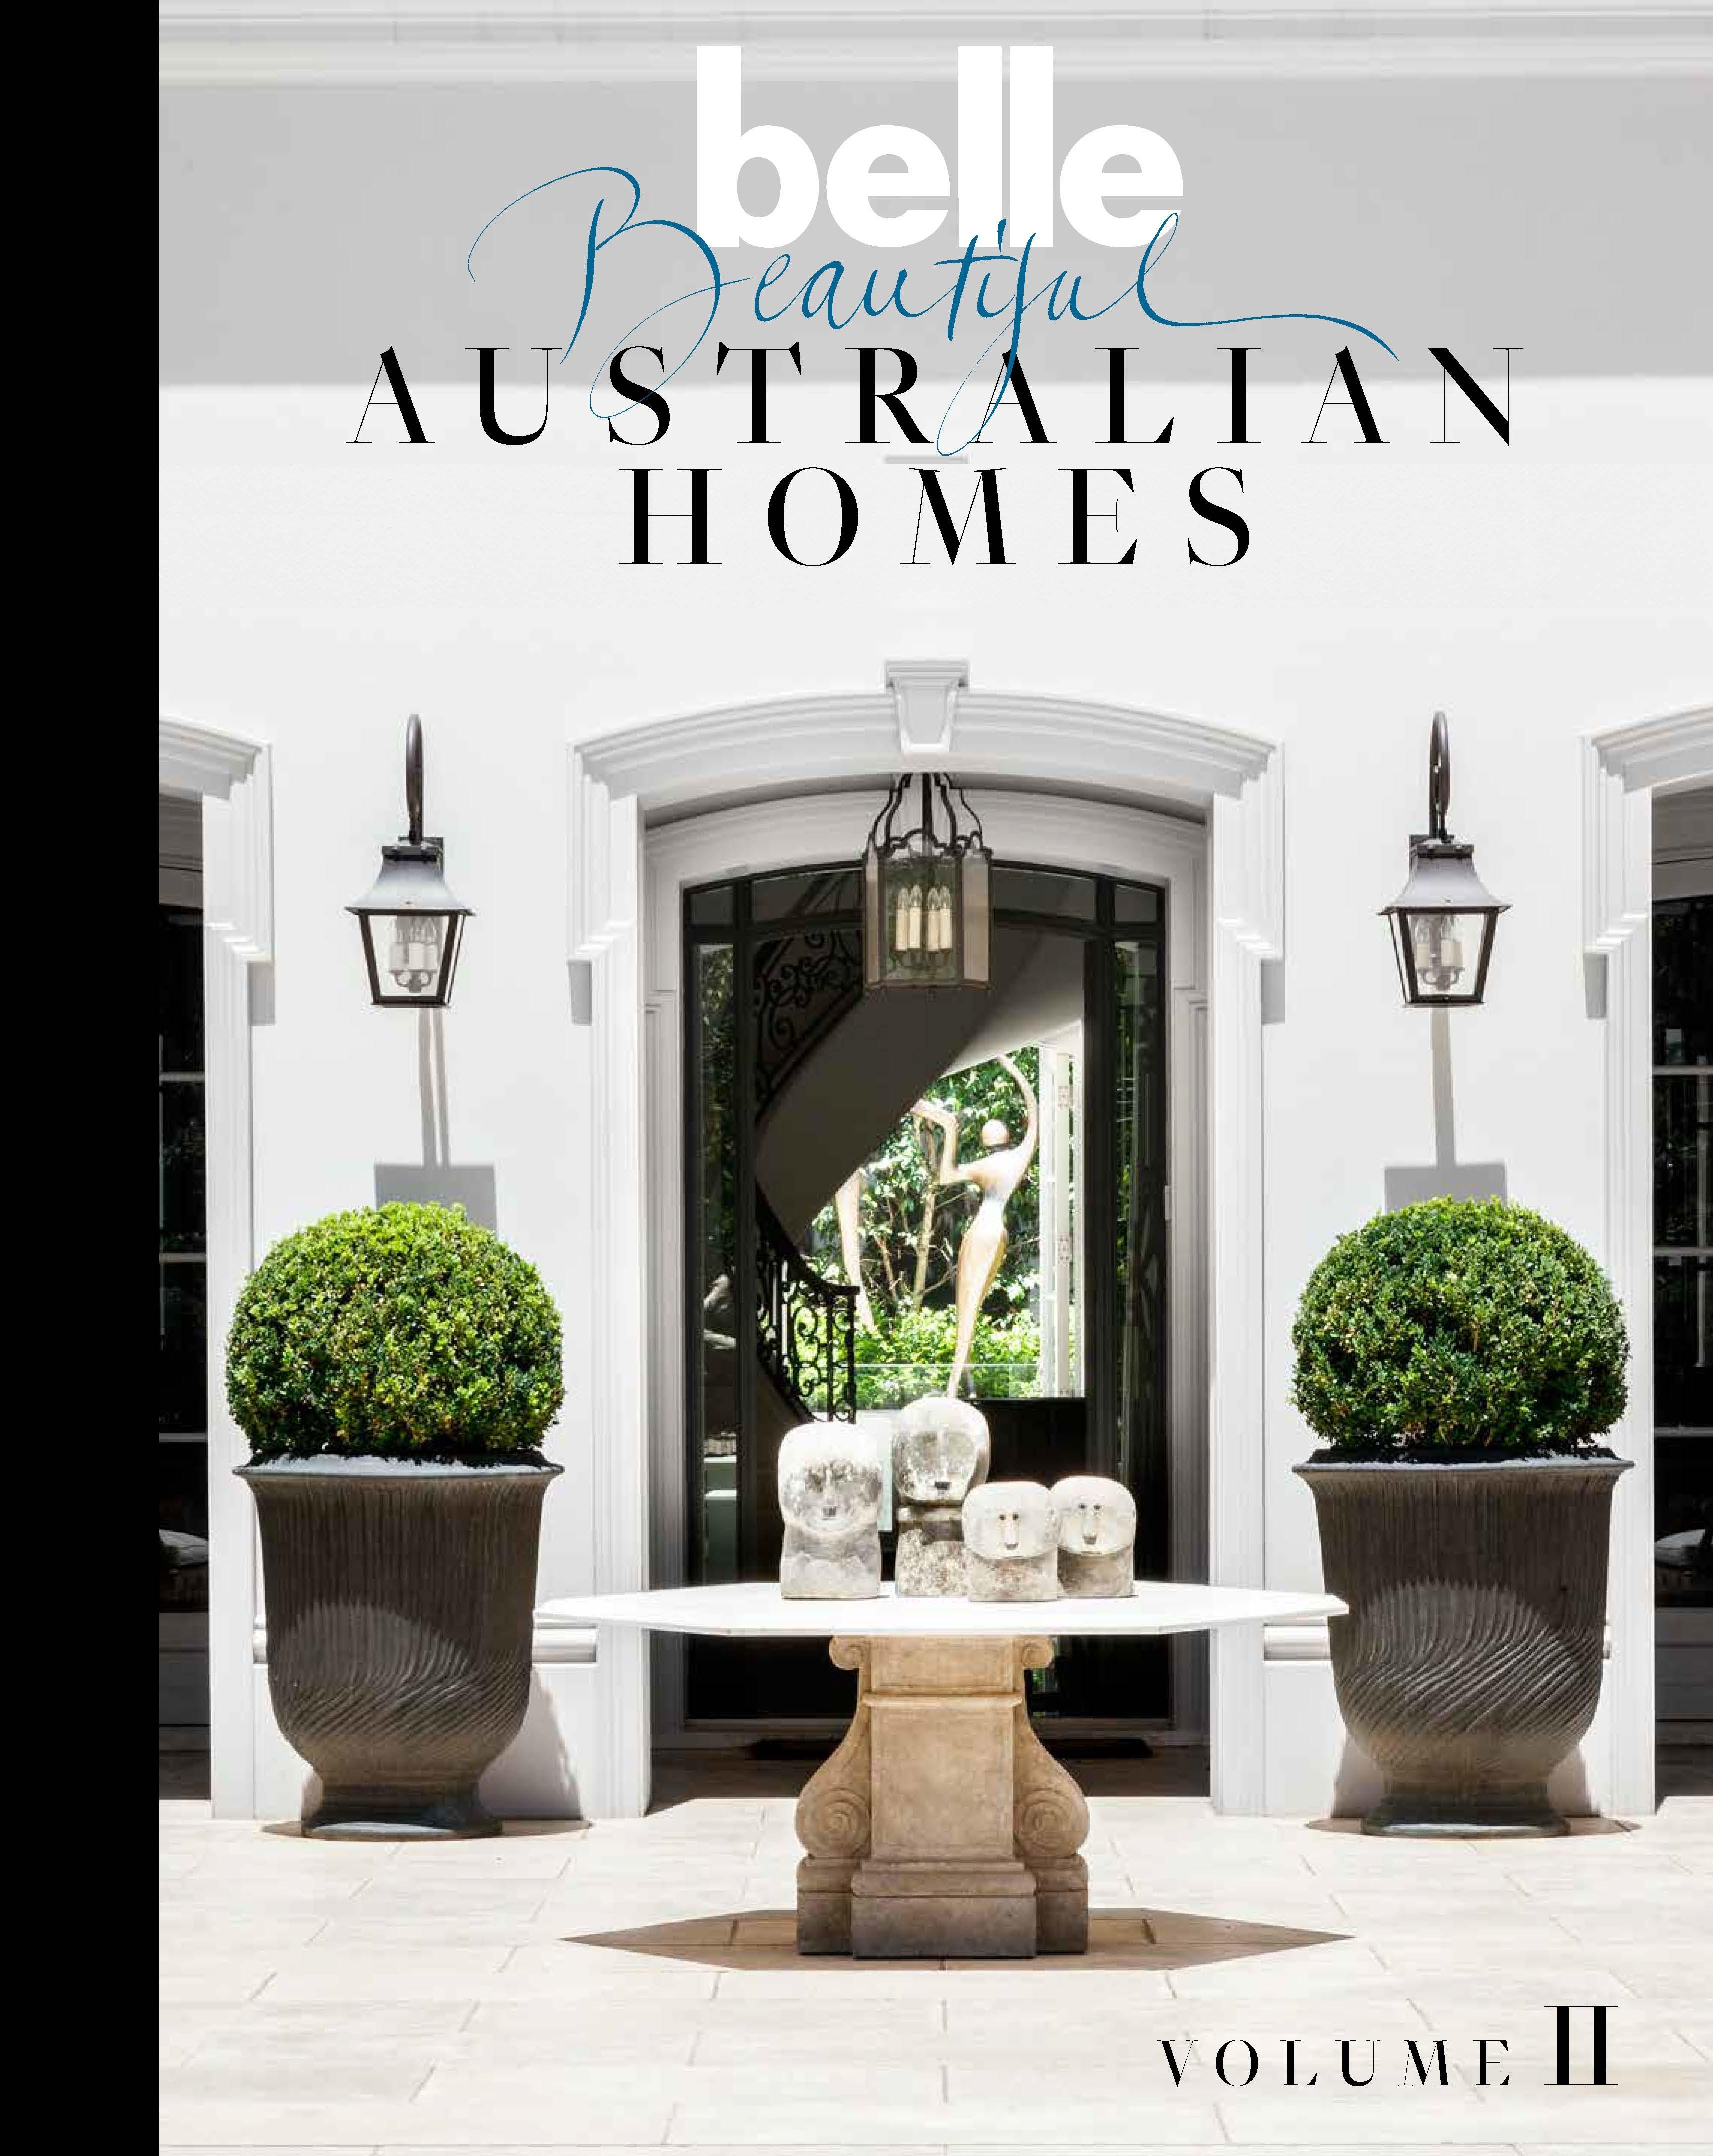 Belle Beautiful Australian Homes Volume II - Penguin Books Australia